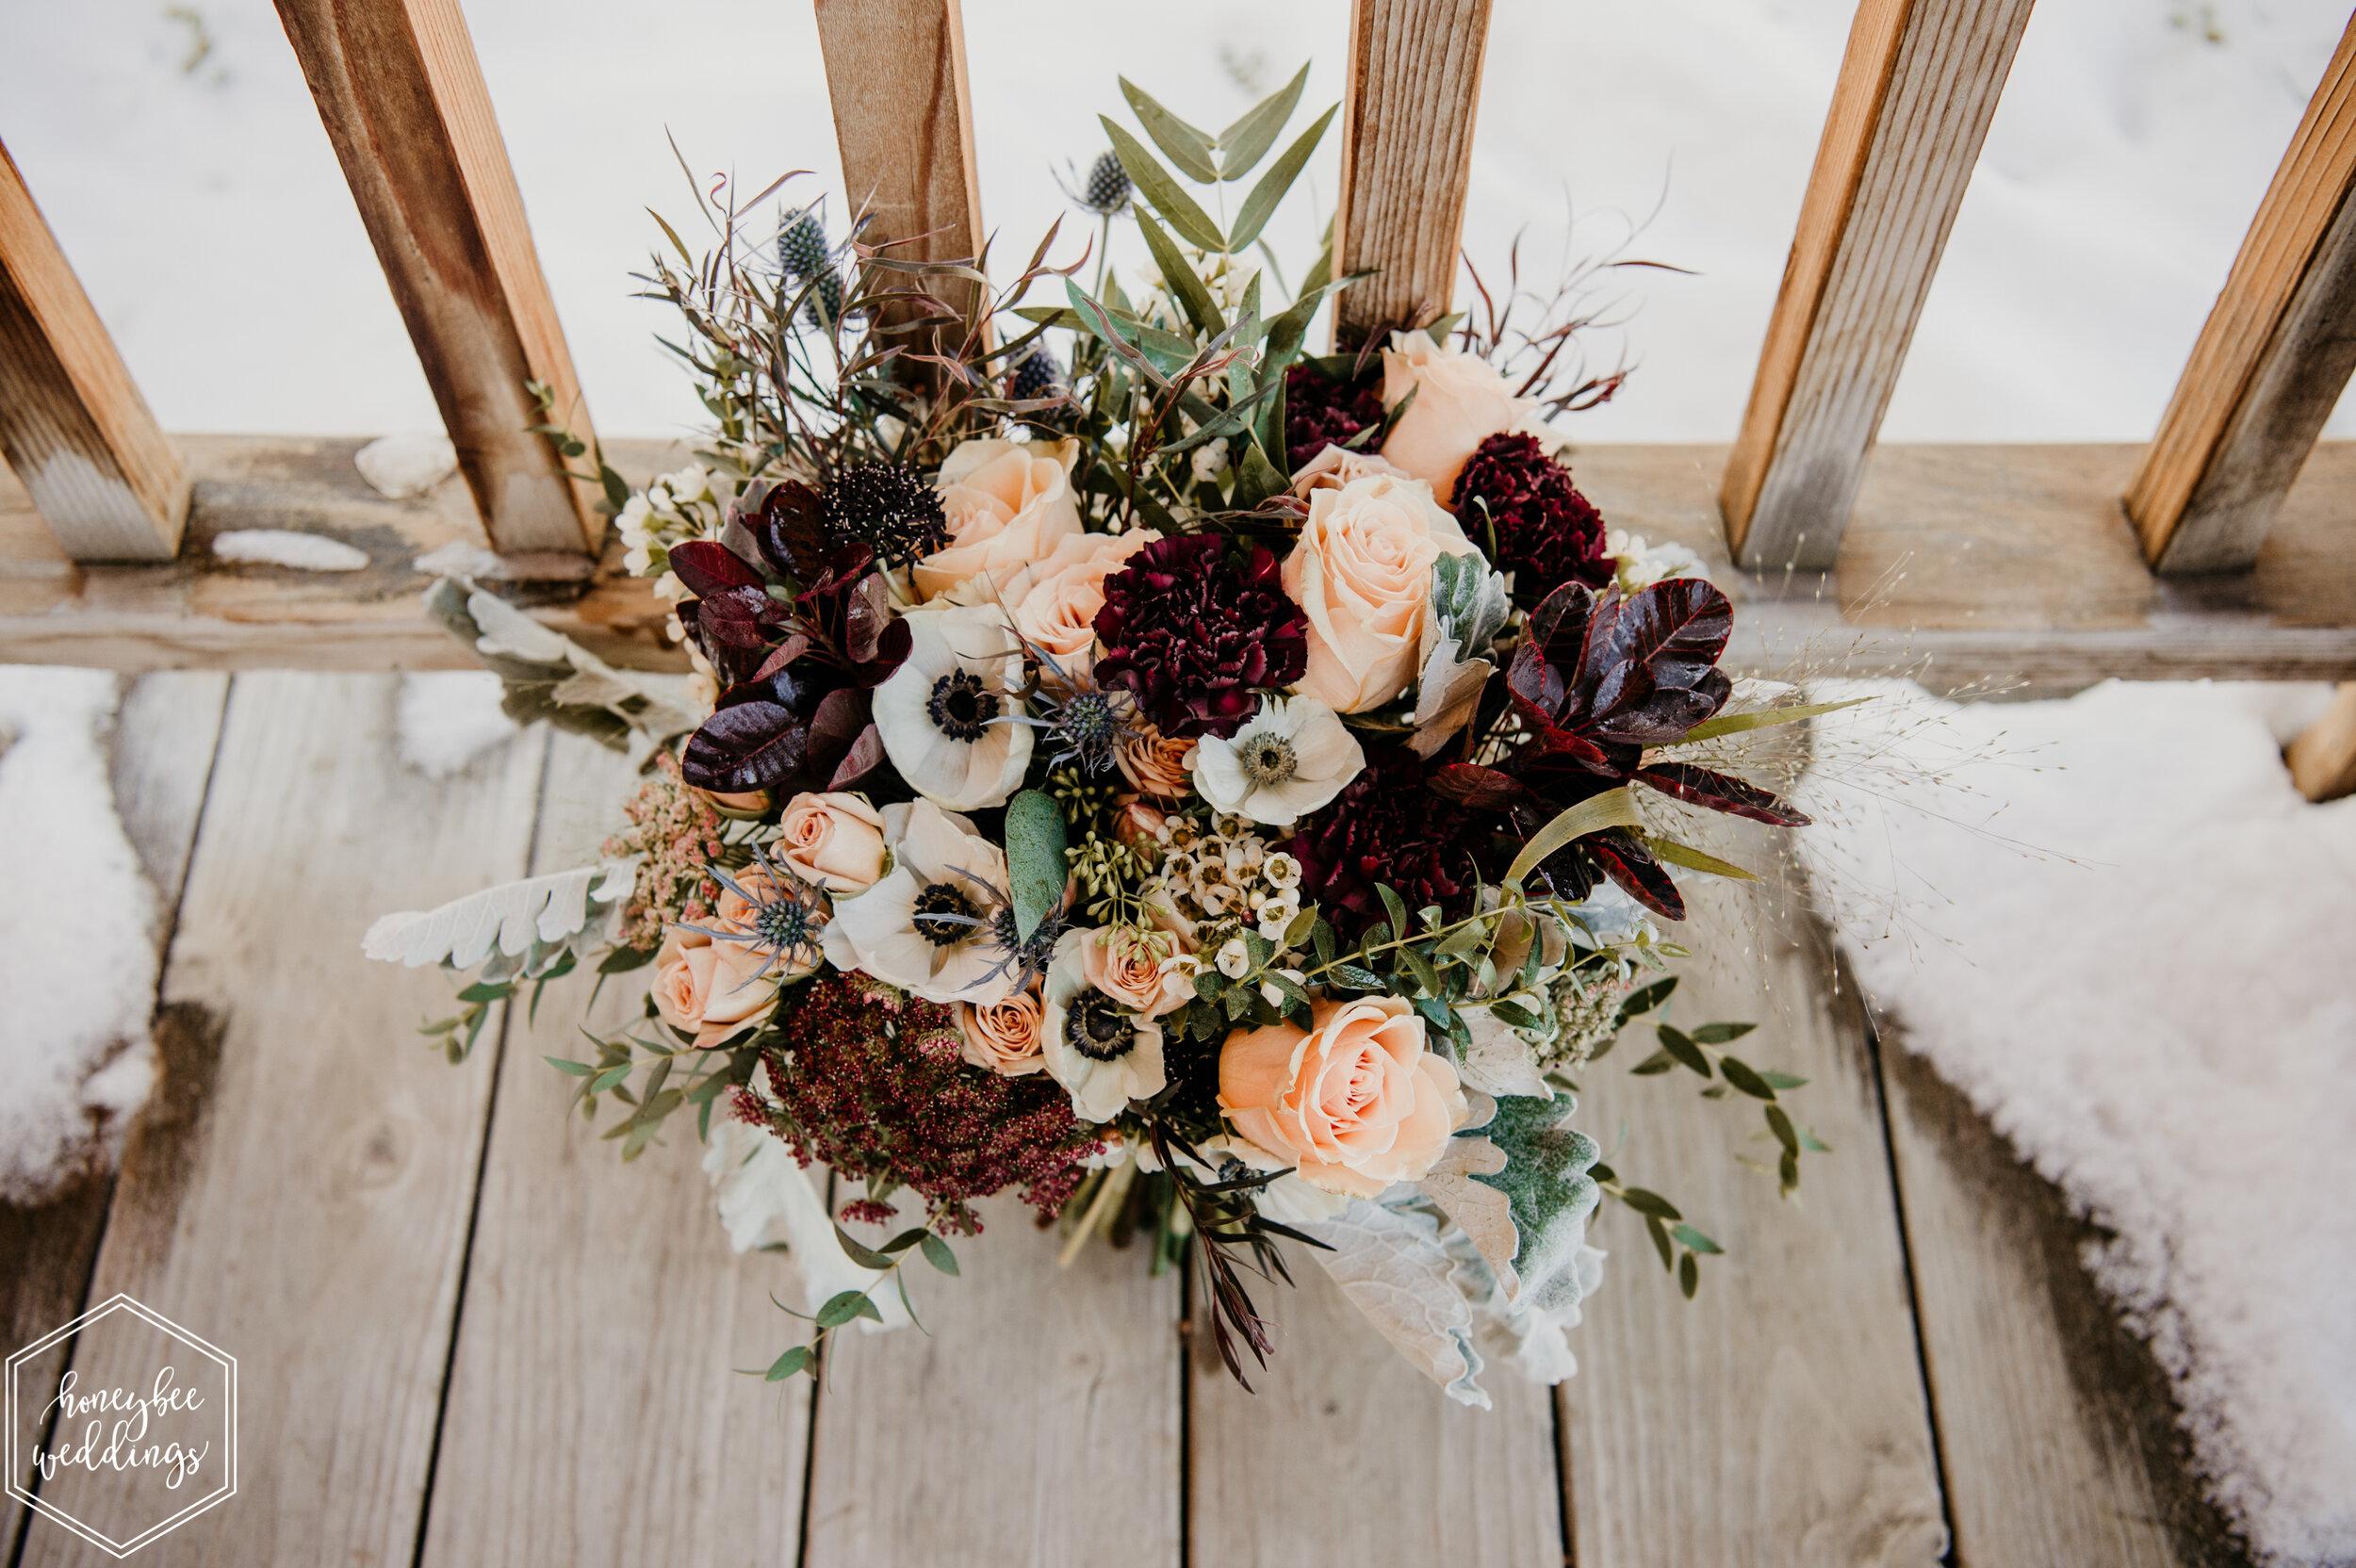 003Chico Hot Springs Wedding_Montana Wedding Photographer_Winter Wedding_Ariel & Richard_October 12, 2019-1872.jpg